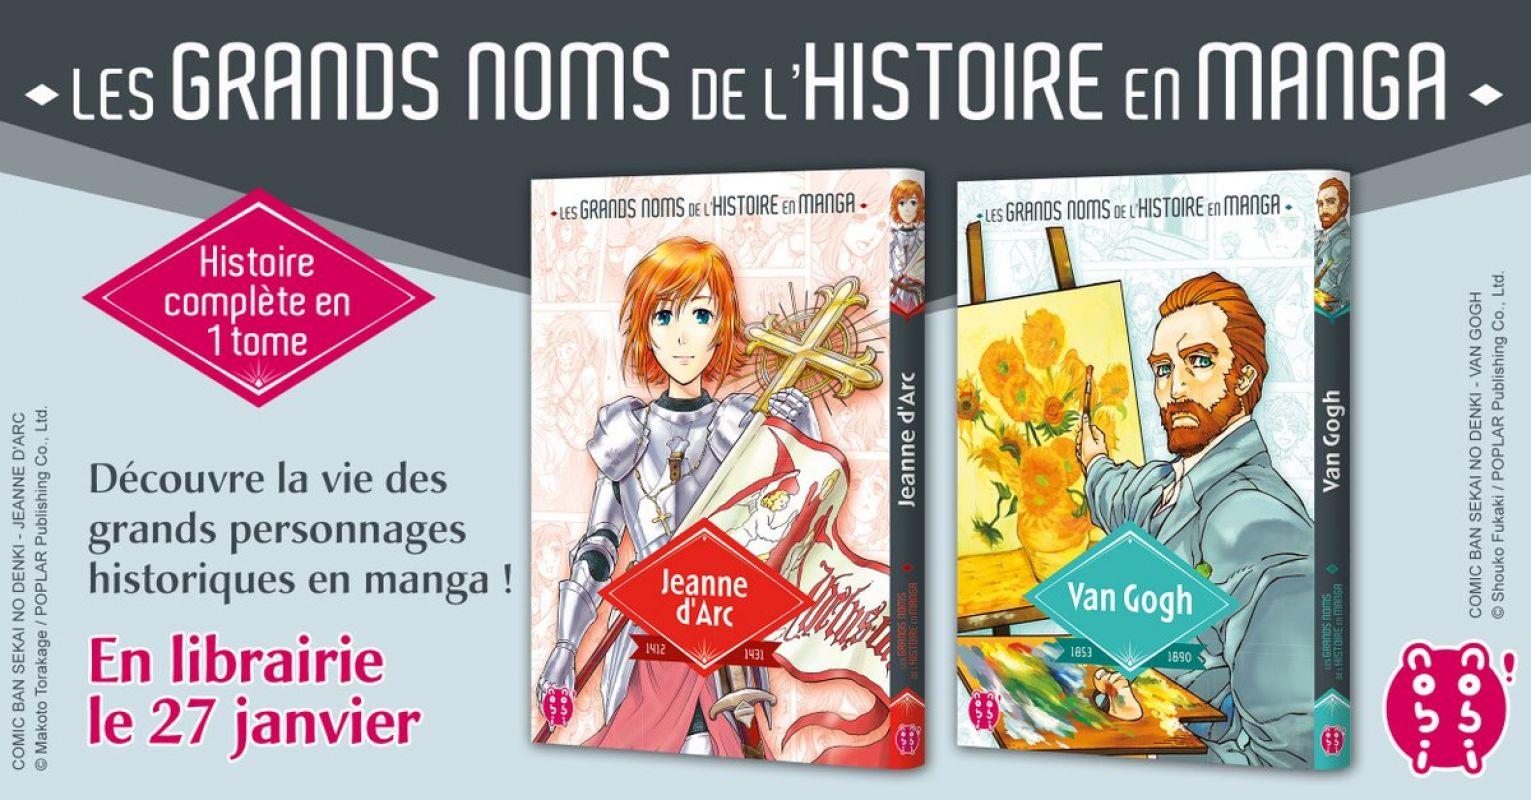 Jeanne d'Arc et Van Gogh chez Nobi-nobi !